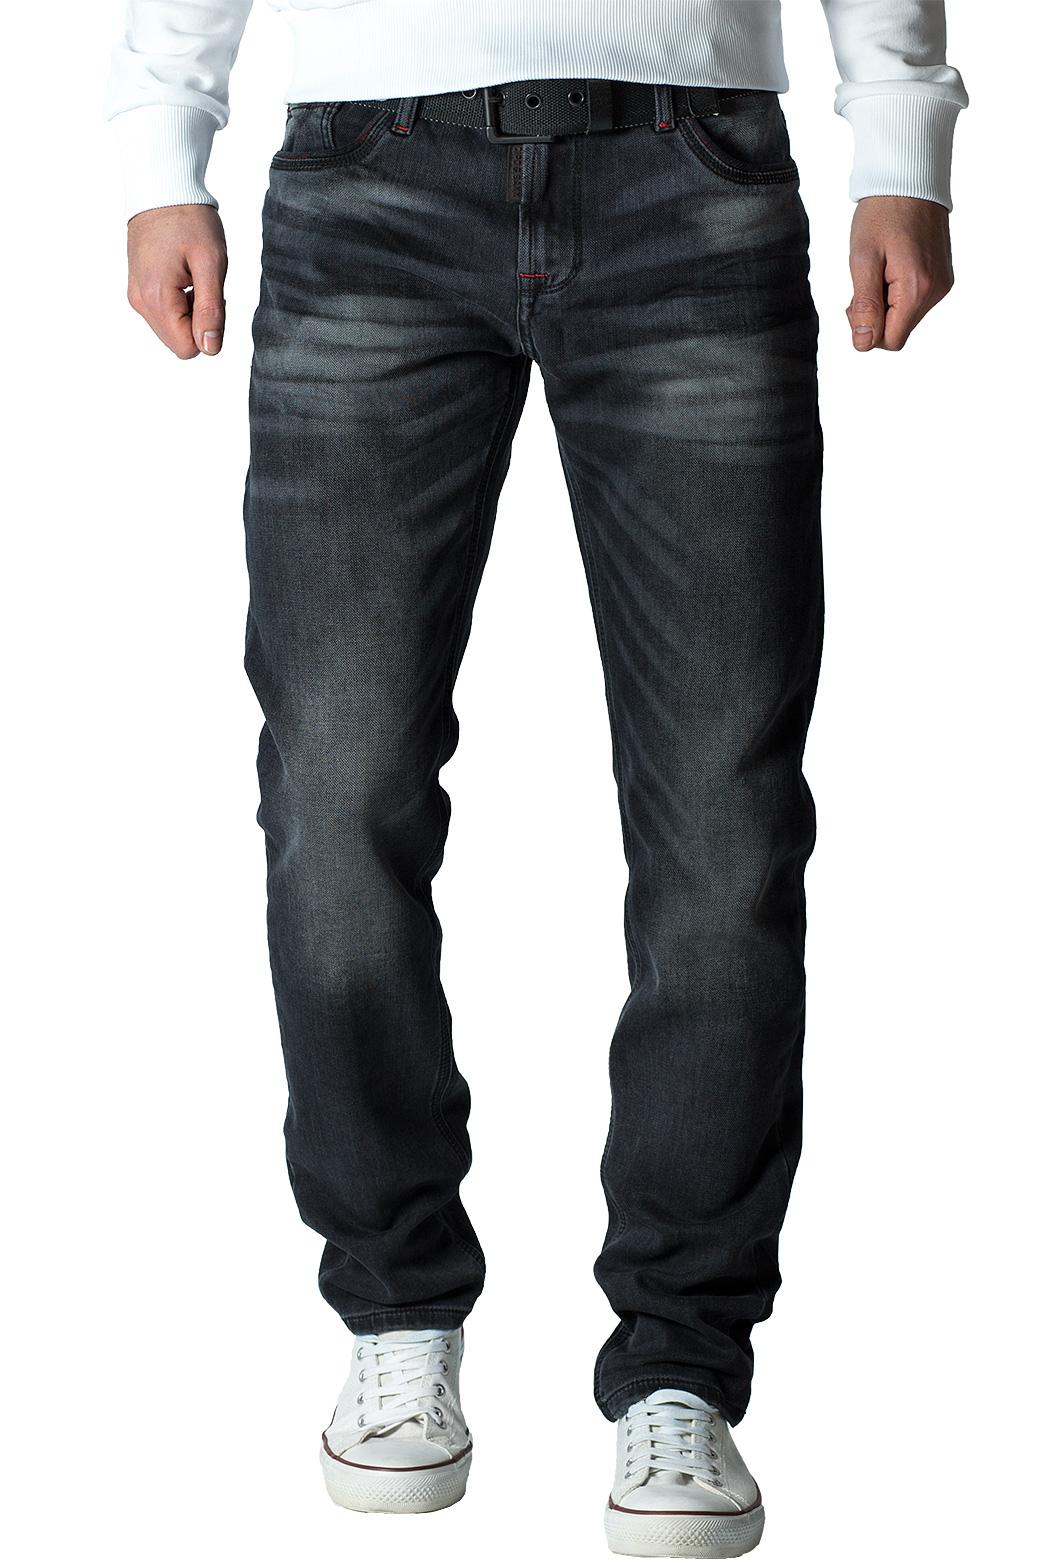 Cipo-amp-Baxx-Uomo-Jeans-Pantaloni-ricamate-Biker-Style-streetwear-nervature-pattern-Dope miniatura 24